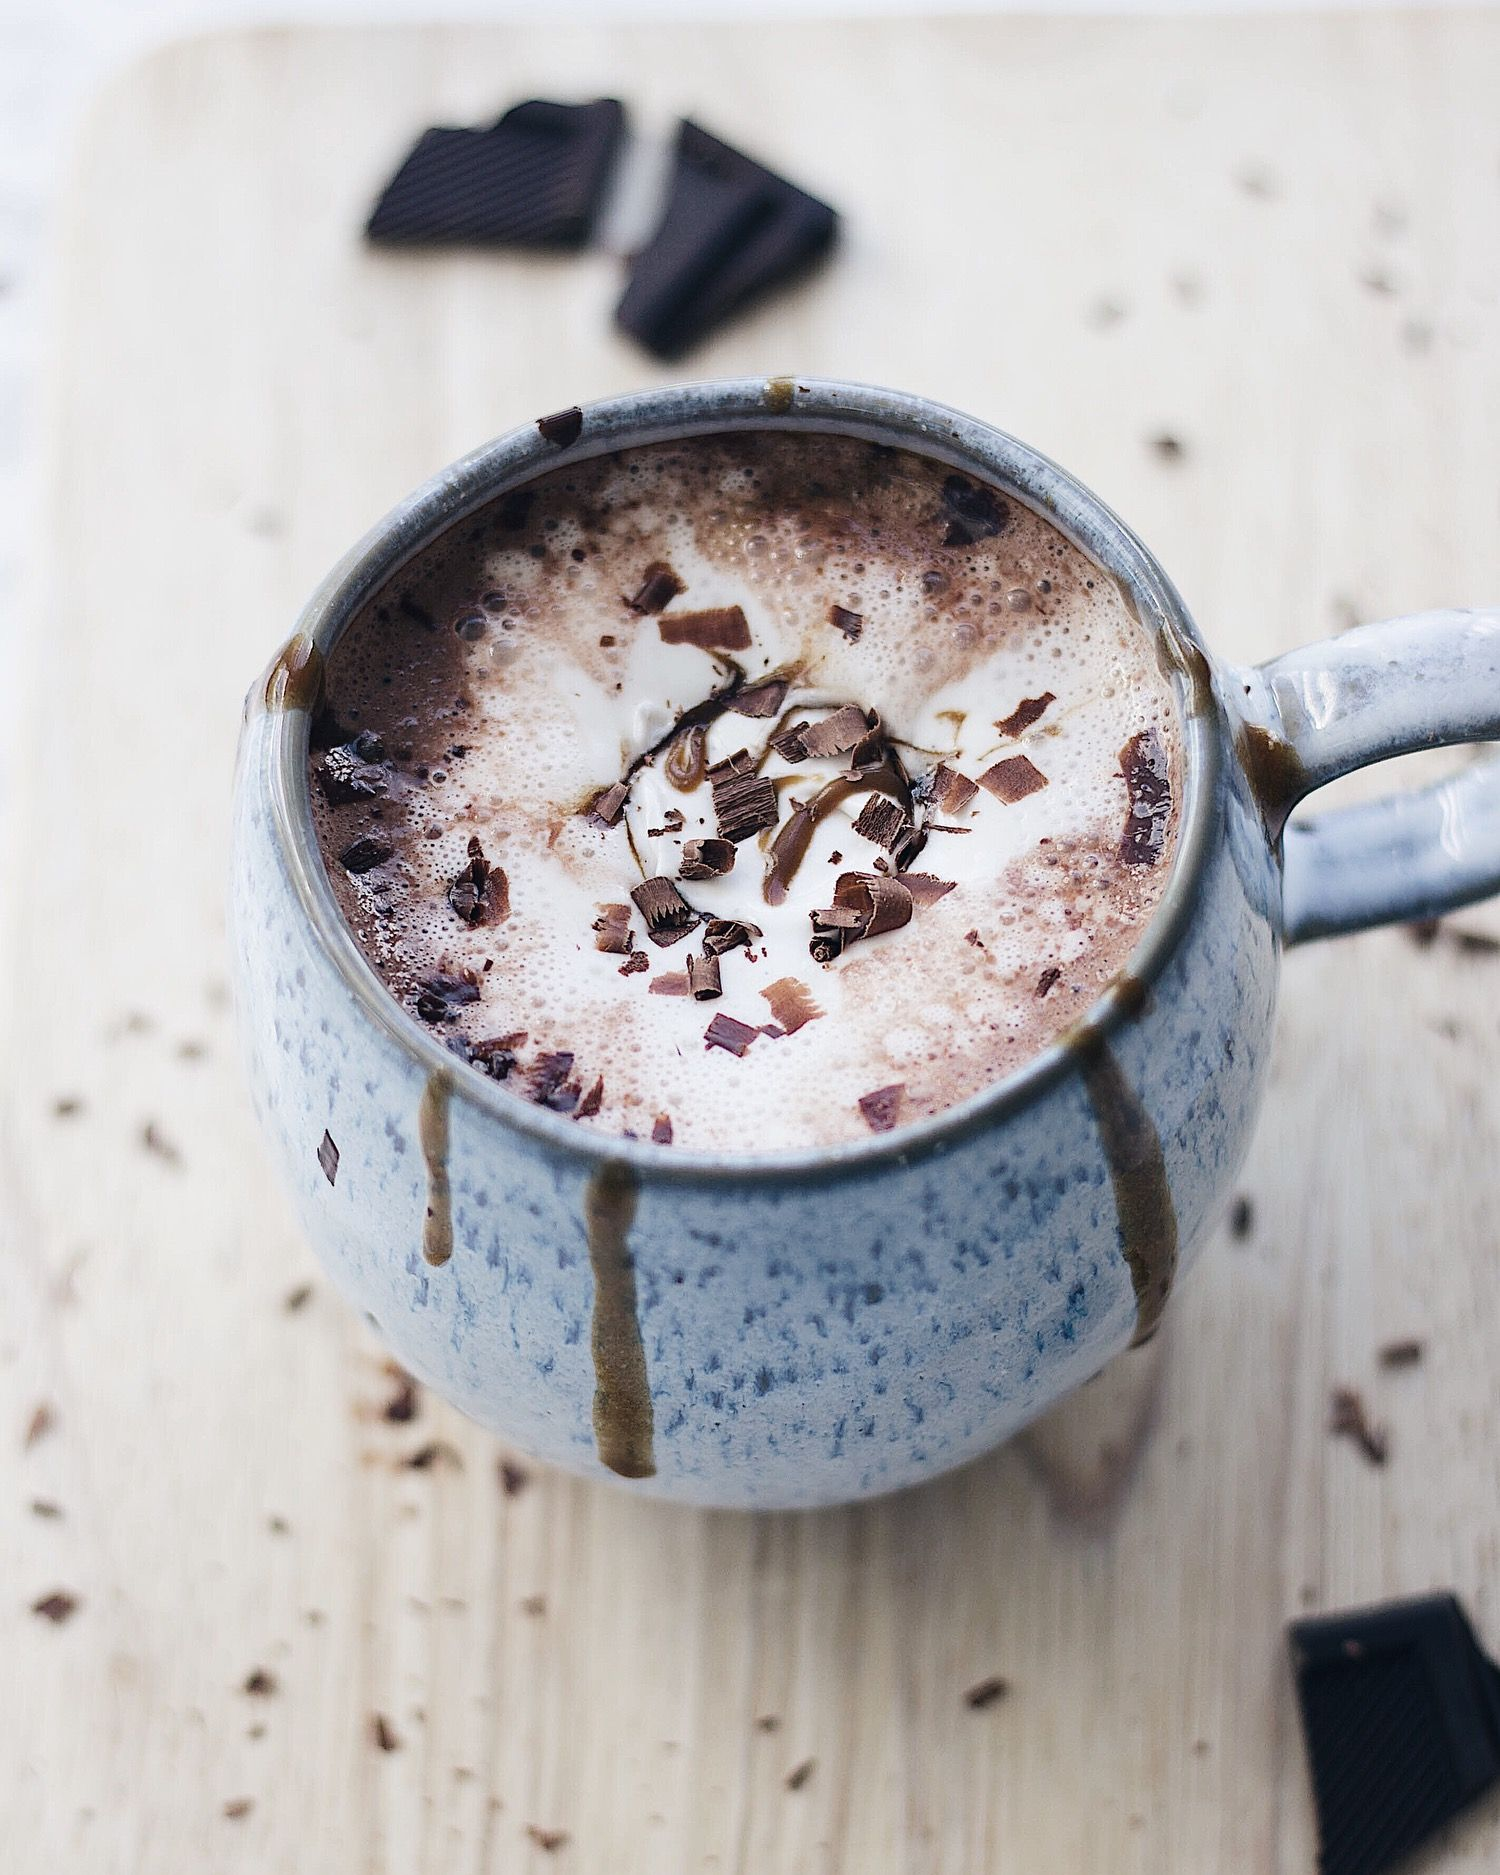 Vegan Creamy Oat Milk Hot Chocolate With Coconut Whipped Cream Recipe Coconut Whipped Cream Oat Milk Oat Milk Recipe